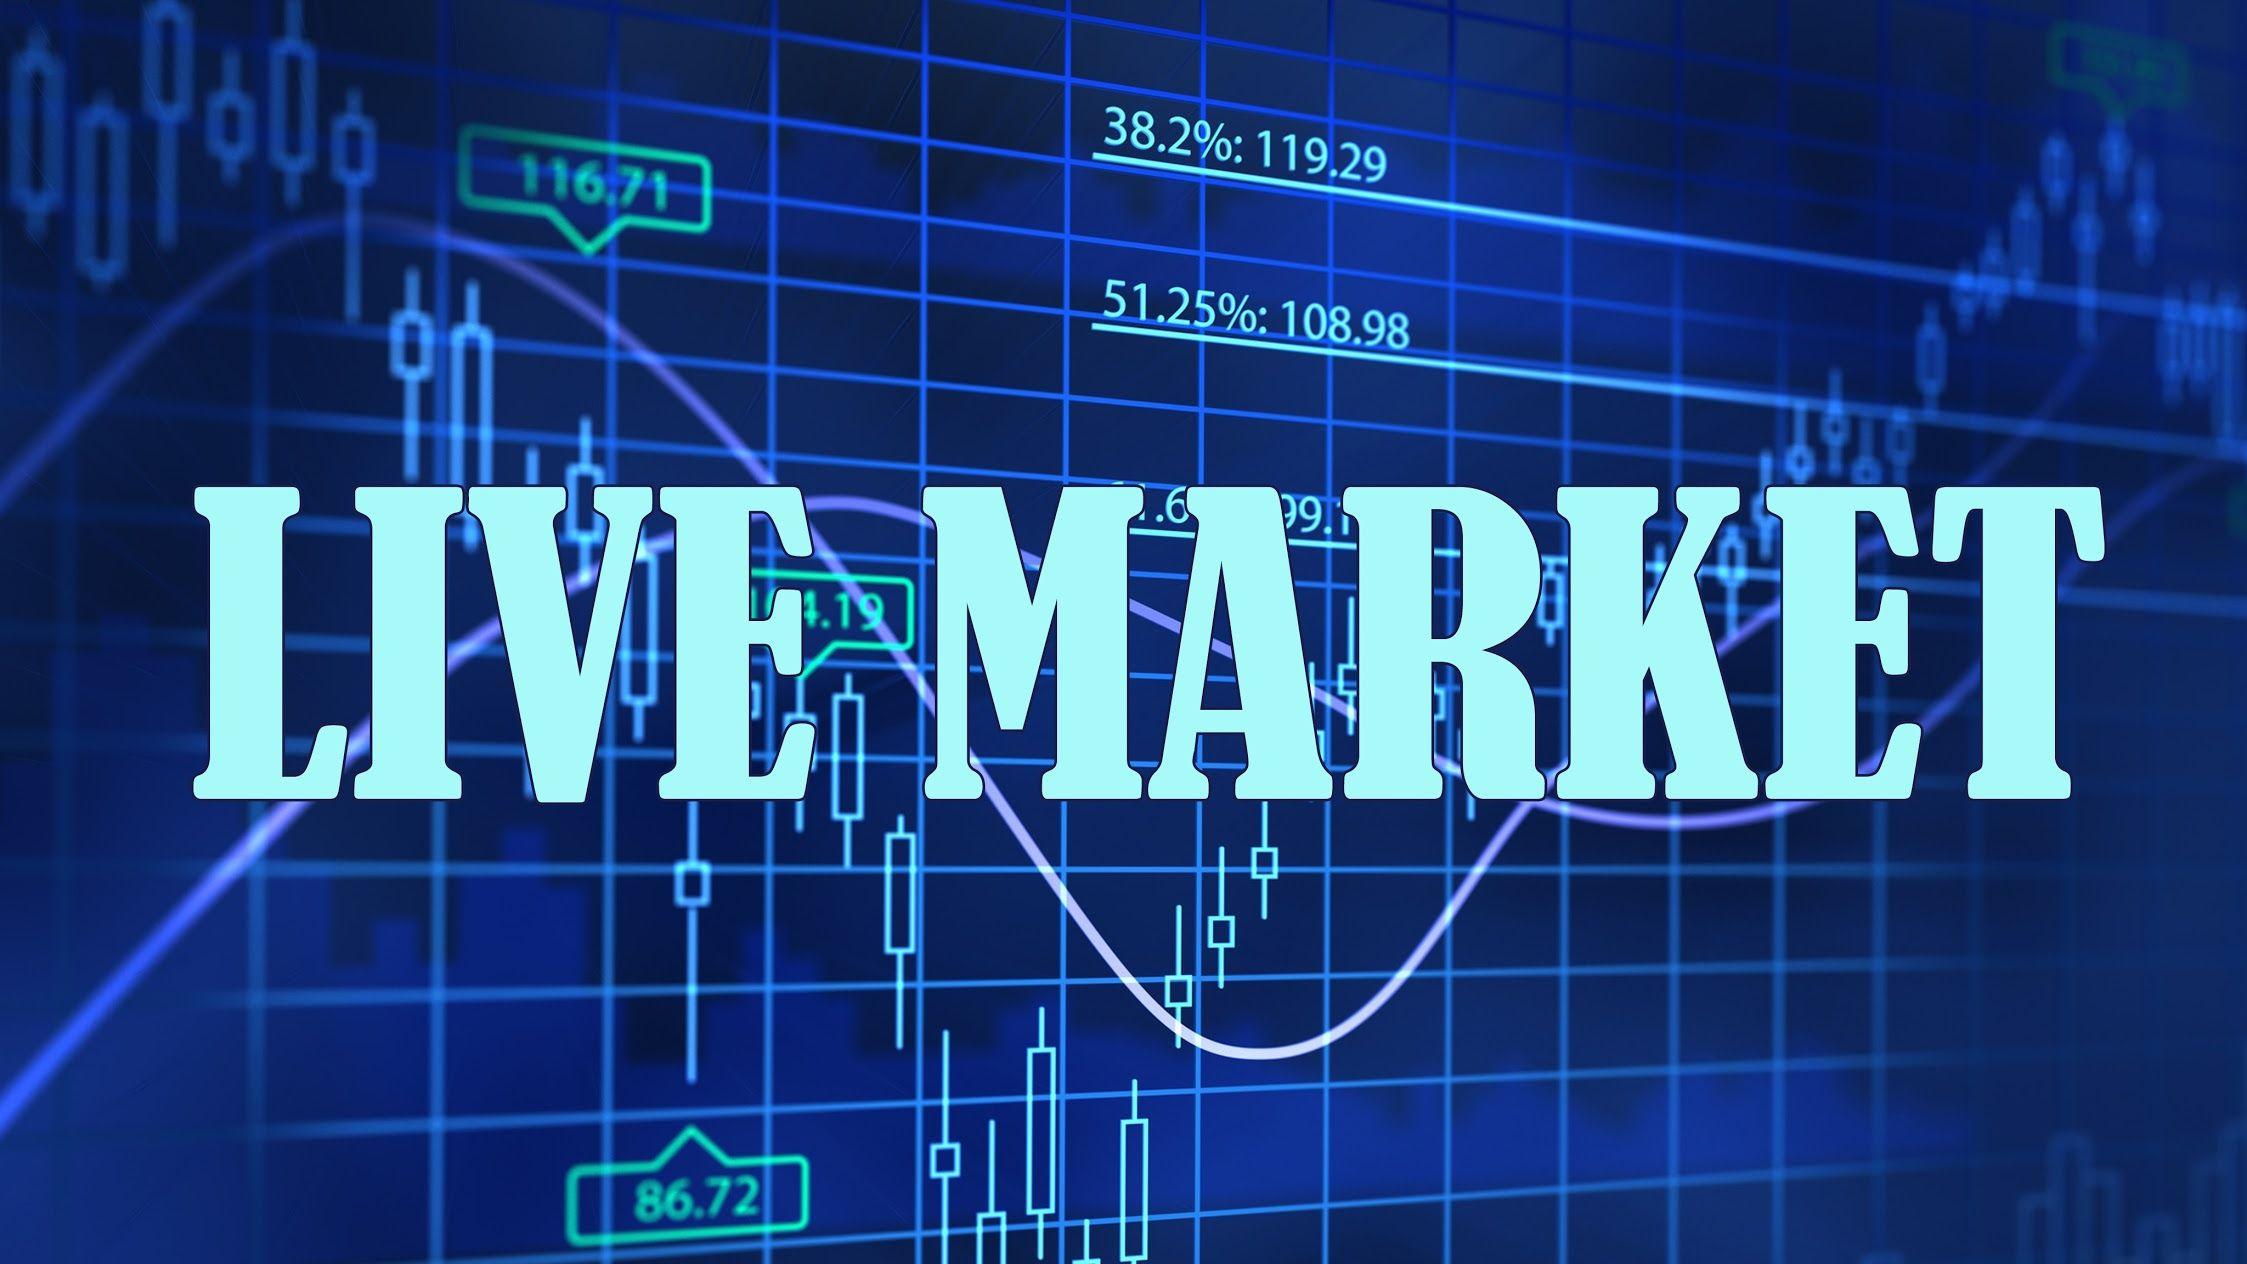 Latest Market activities Marketing, Crude oil, Activities